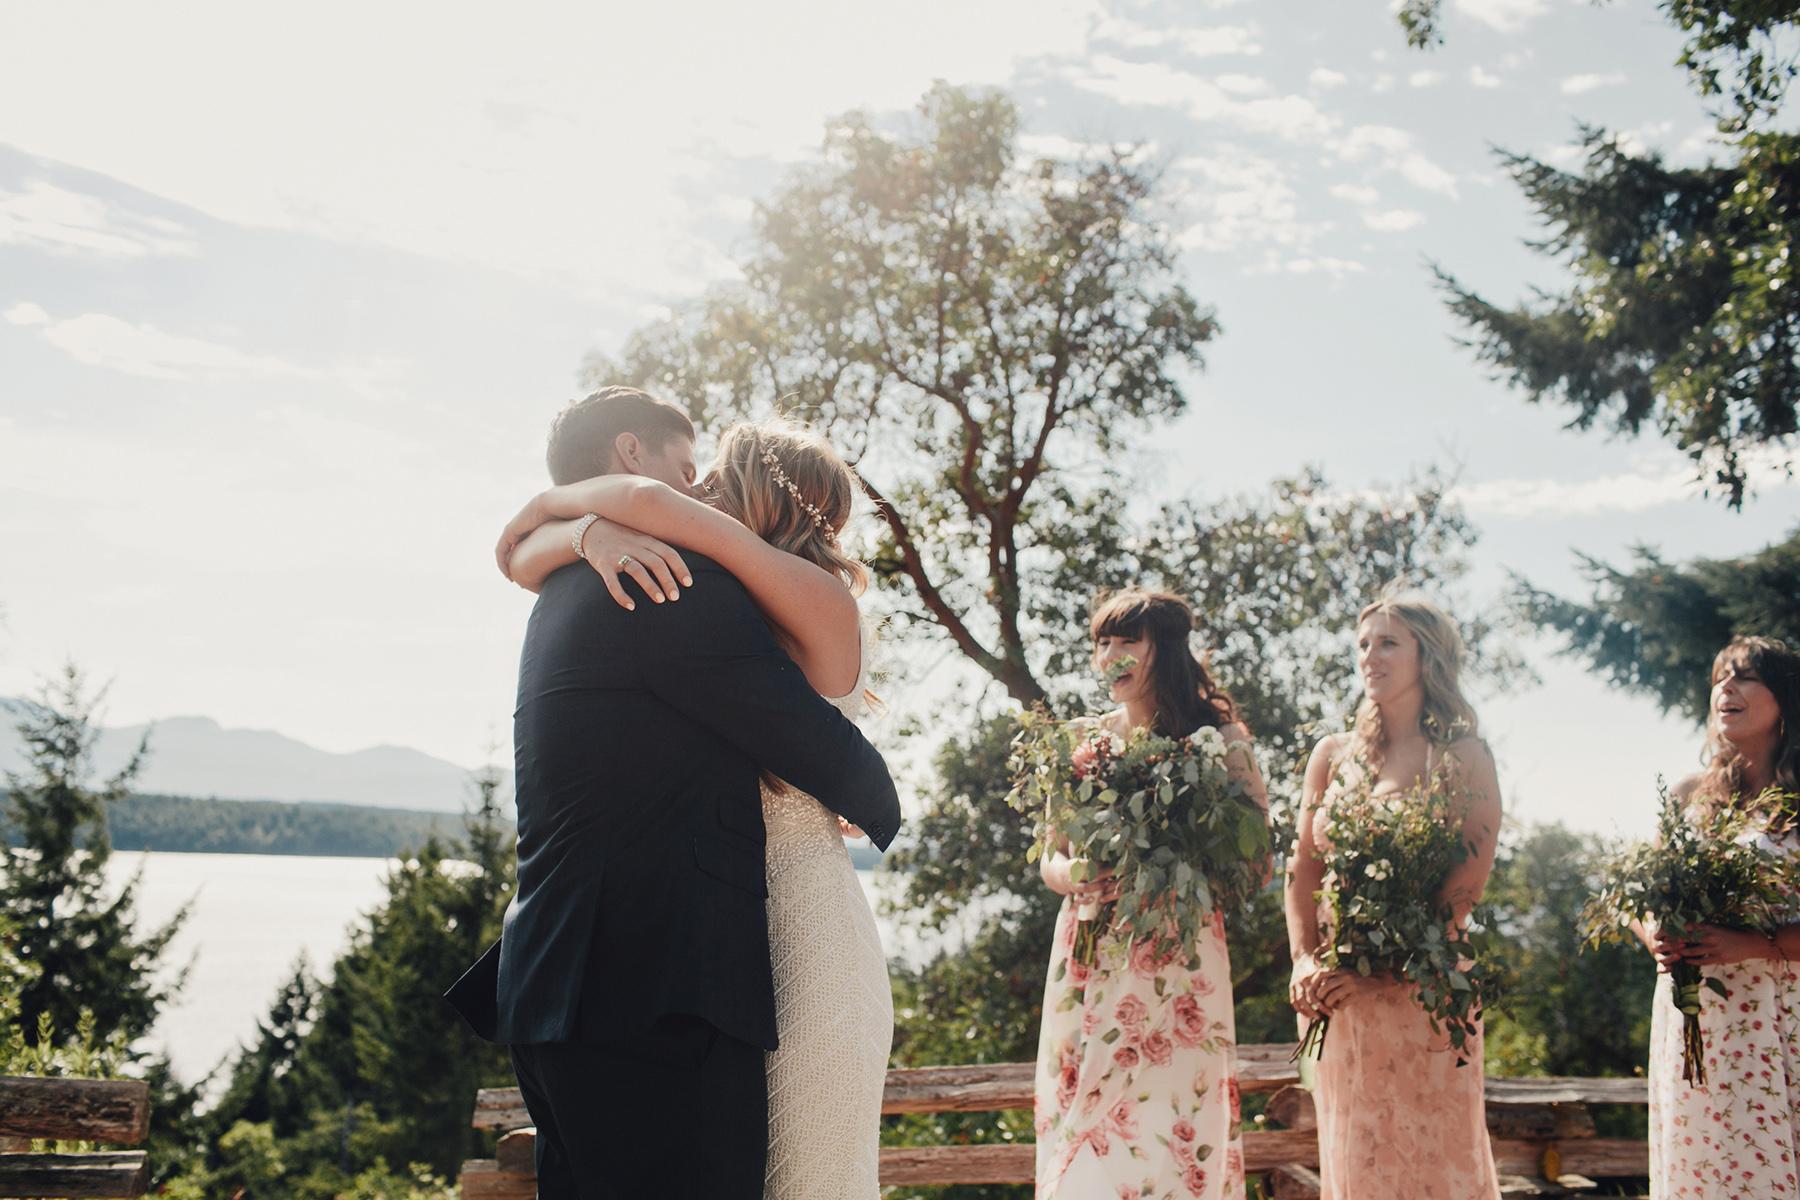 galiano-island-bodega-destination-wedding-0066.JPG